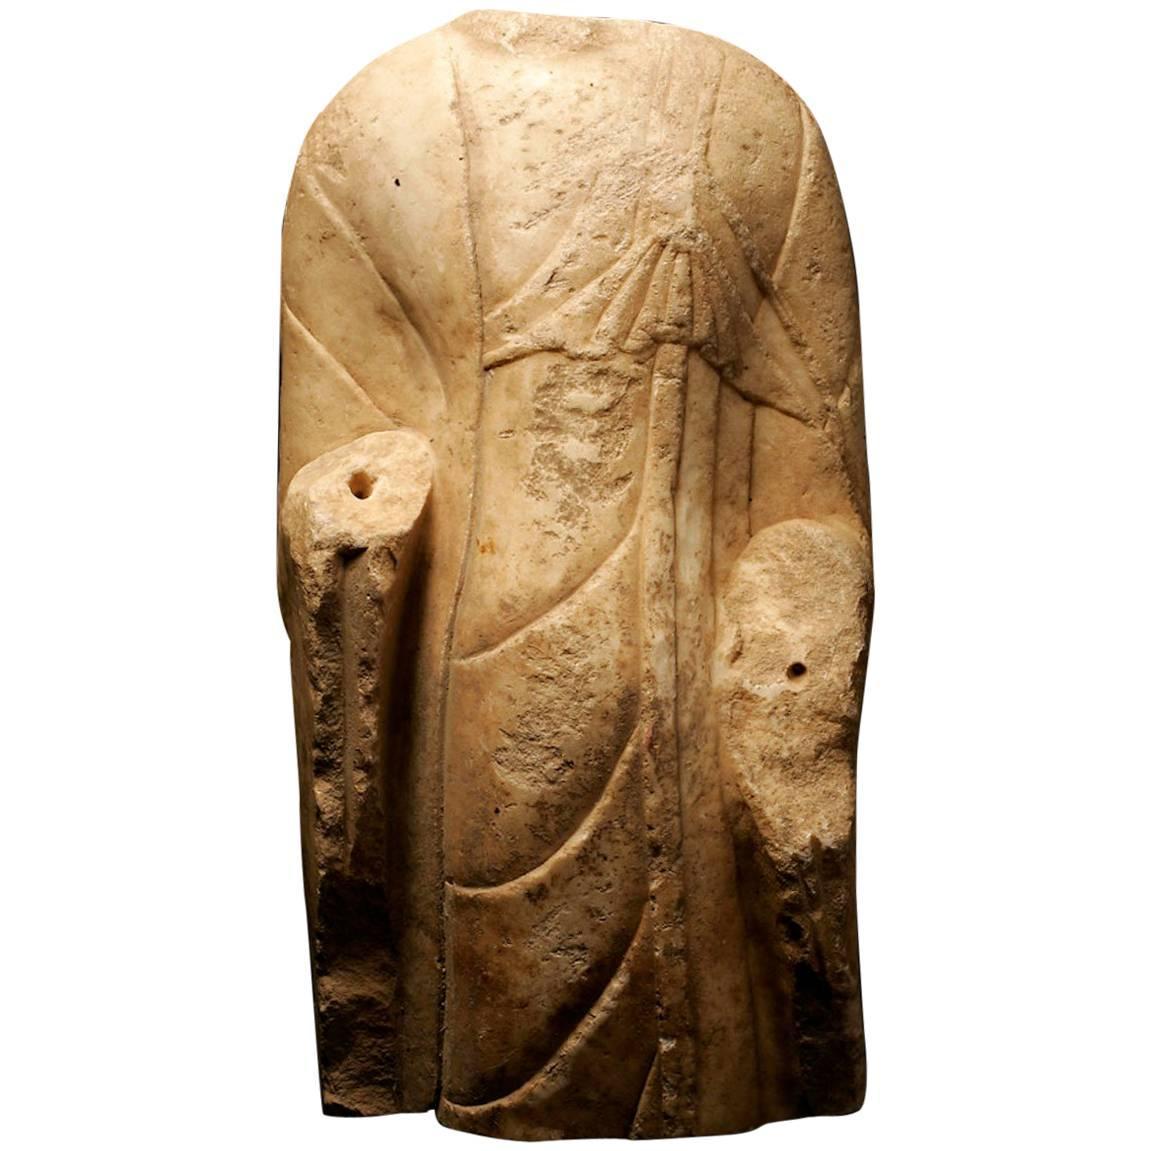 Monumental Buddha Torso White Marble Sculpture - Tang Dynasty China 618-907 AD